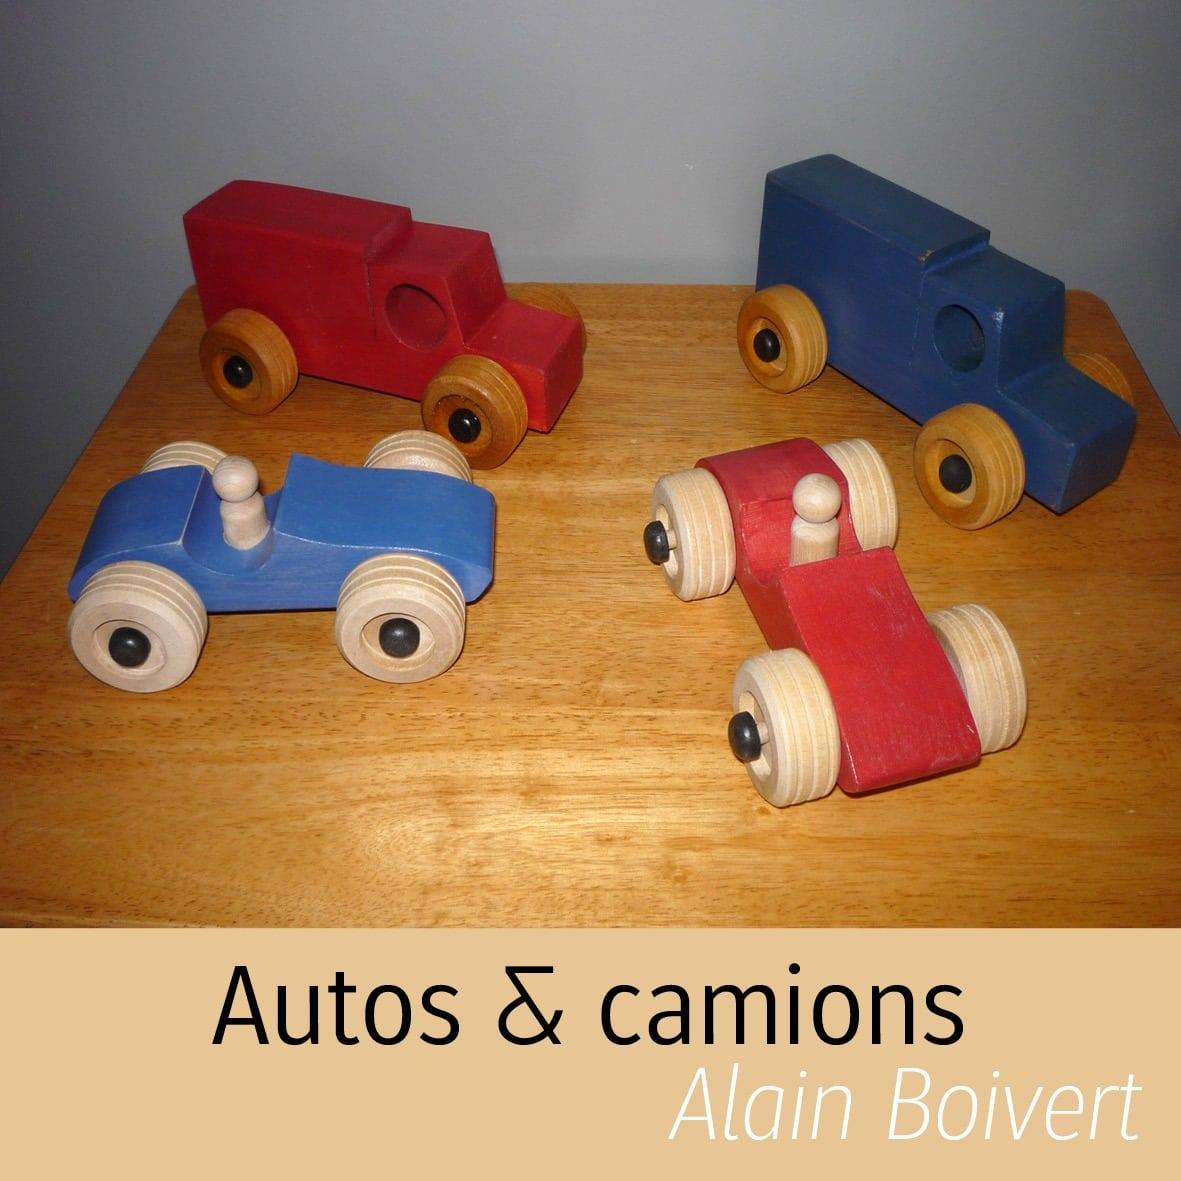 autos en bois Alain Boisvert